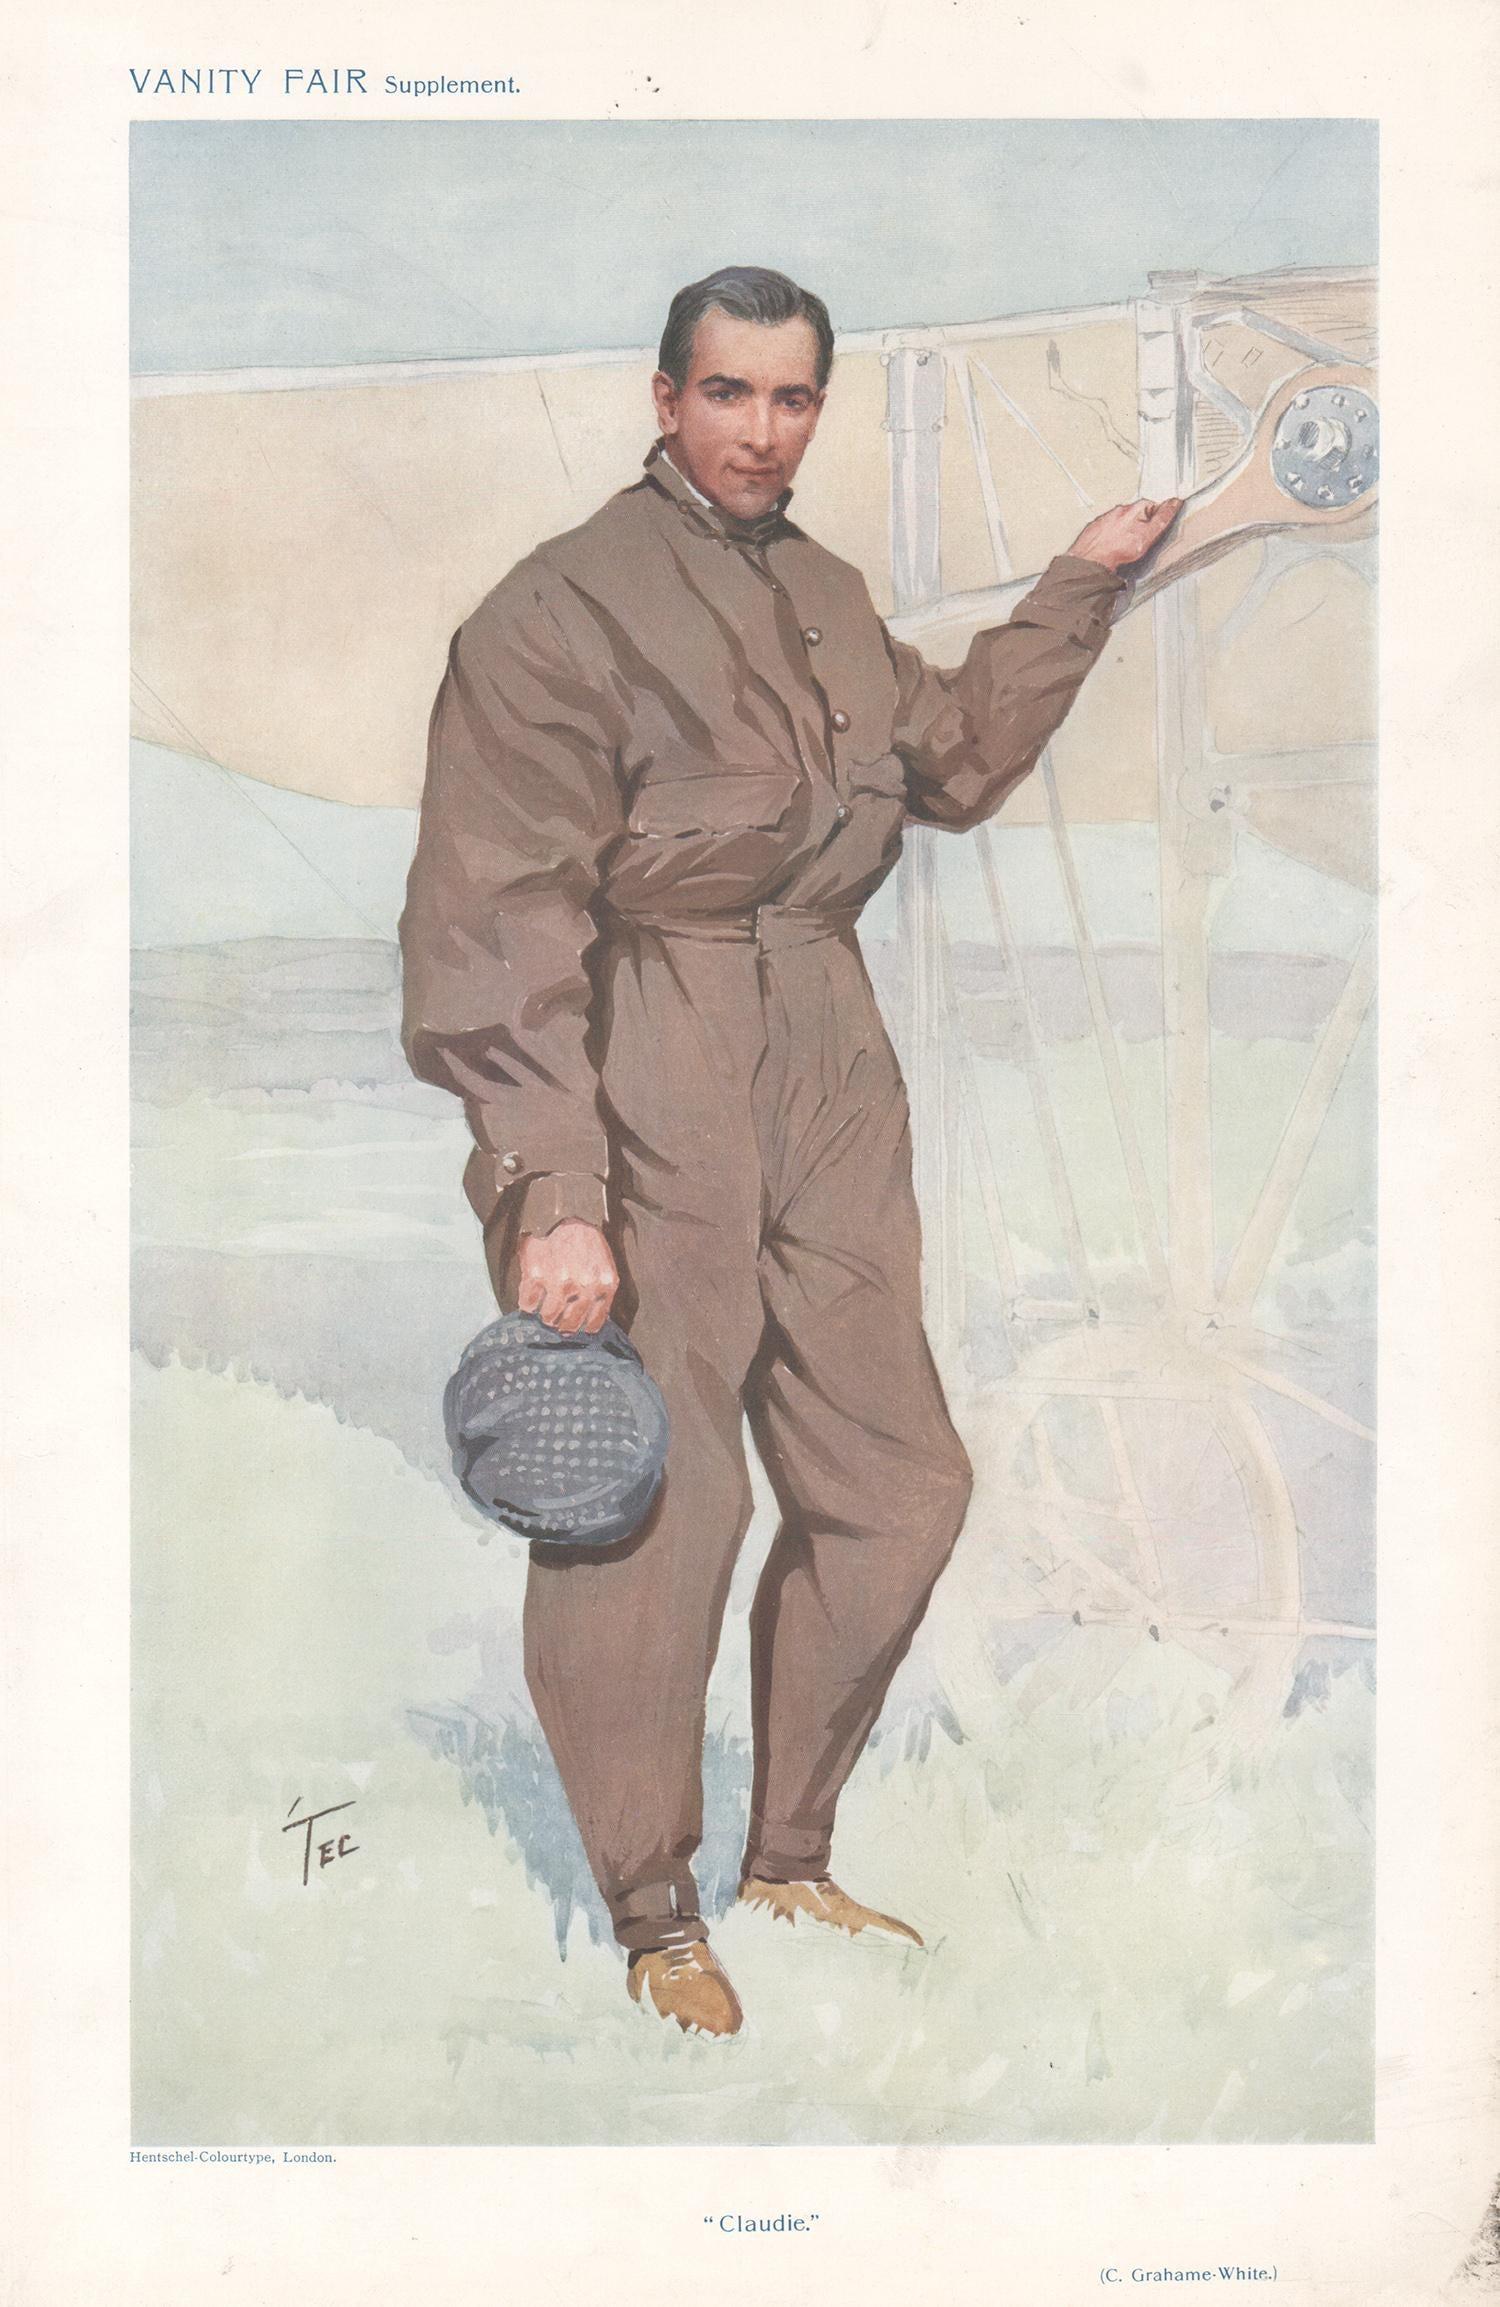 Claude Grahame-White, aviator, Vanity Fair portrait chromolithograph, 1911